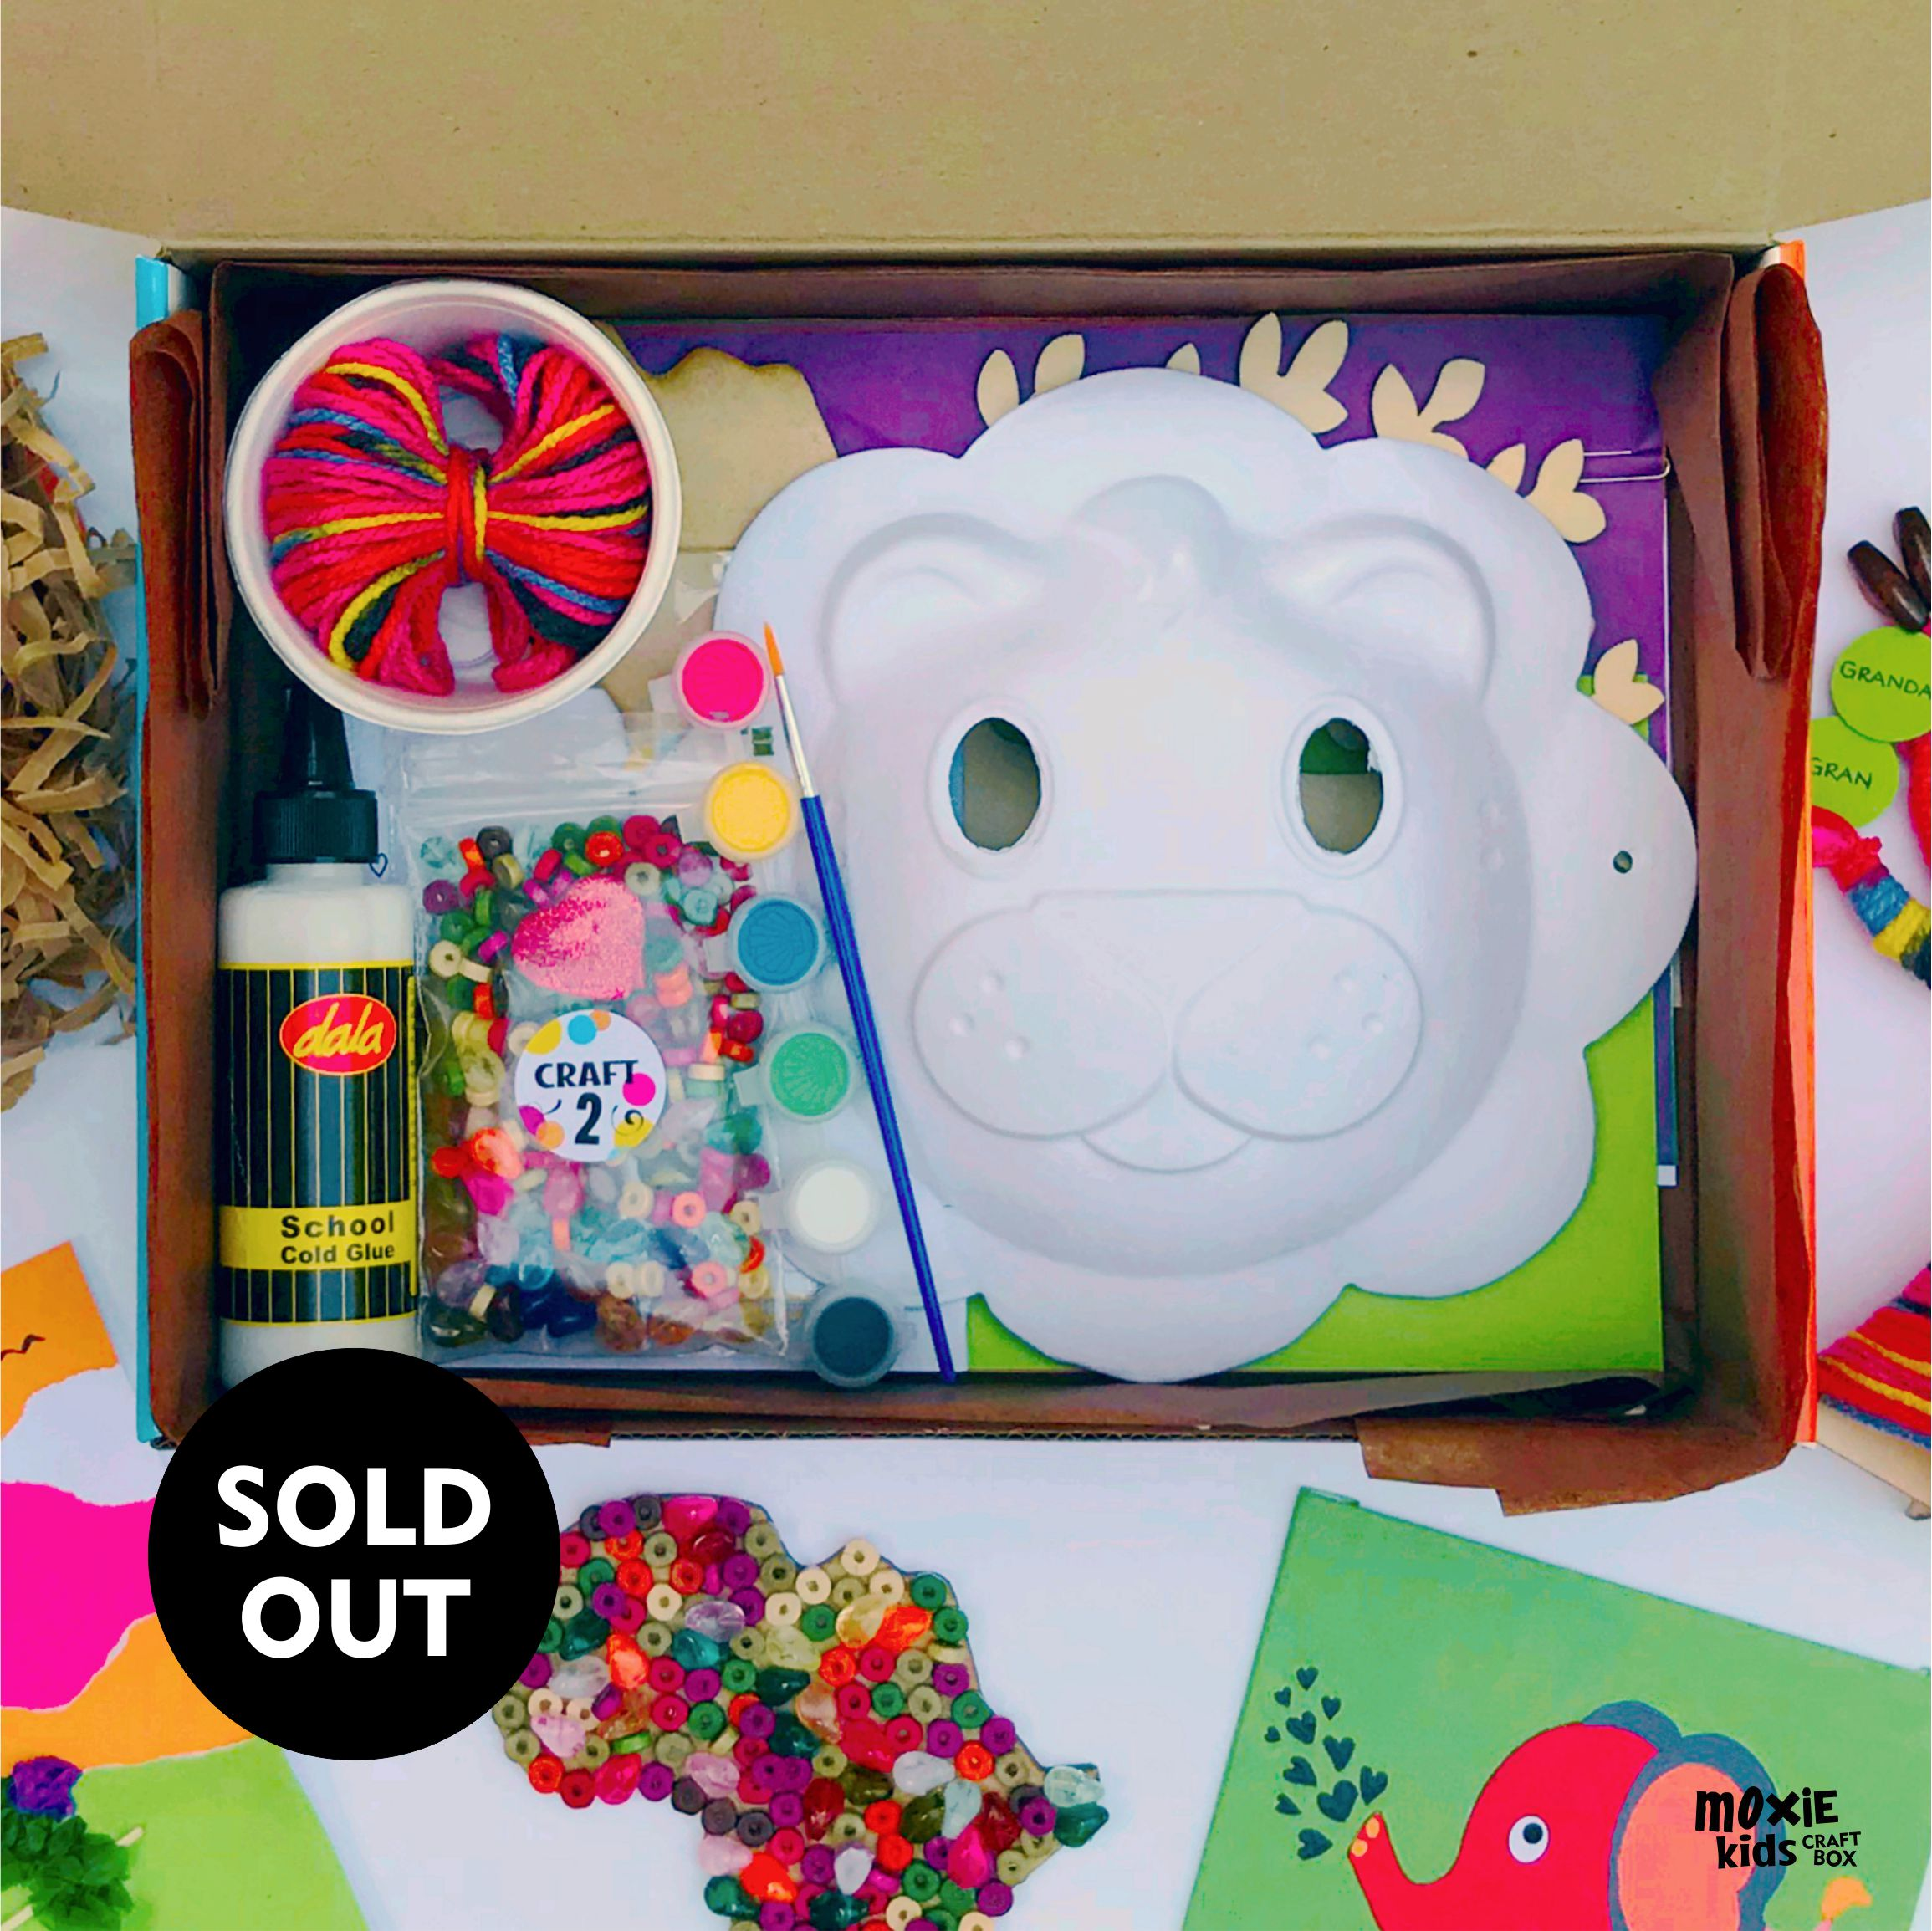 https://www.moxiekids.co.za/wp-content/uploads/2021/02/Moxie-Kids-The-Wild-Side-Sold-Out.jpg